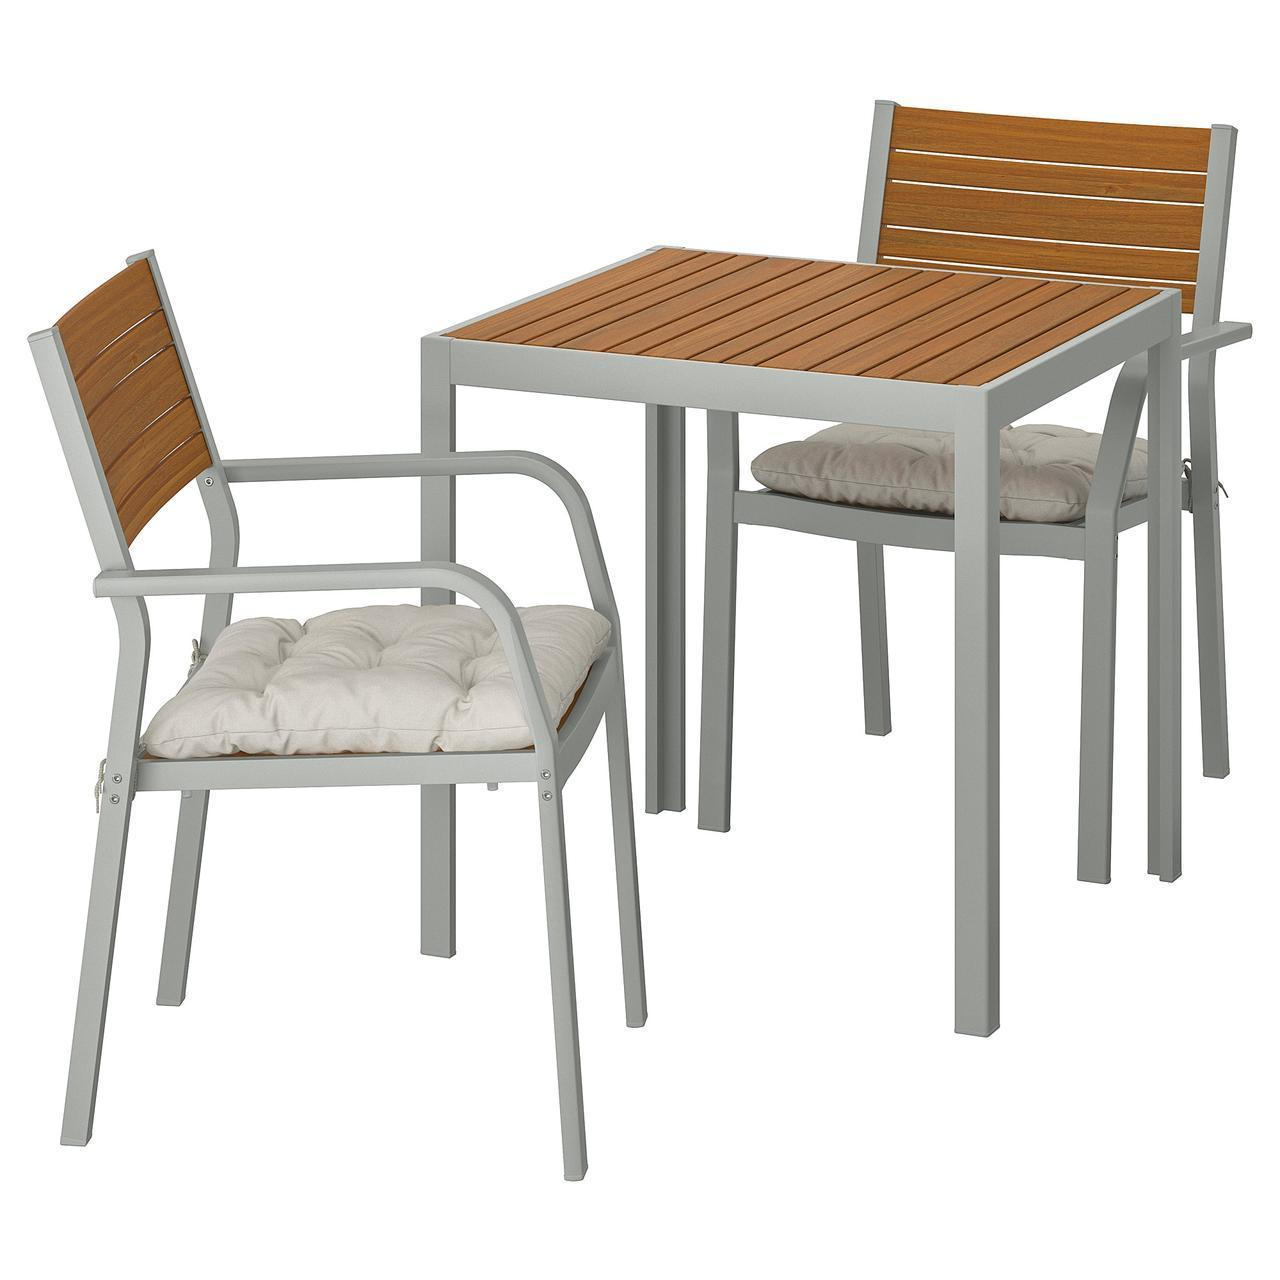 IKEA SJALLAND Садовый стол и 2 стула, светло-коричневый, Куддарна темно-серый  (492.871.66)